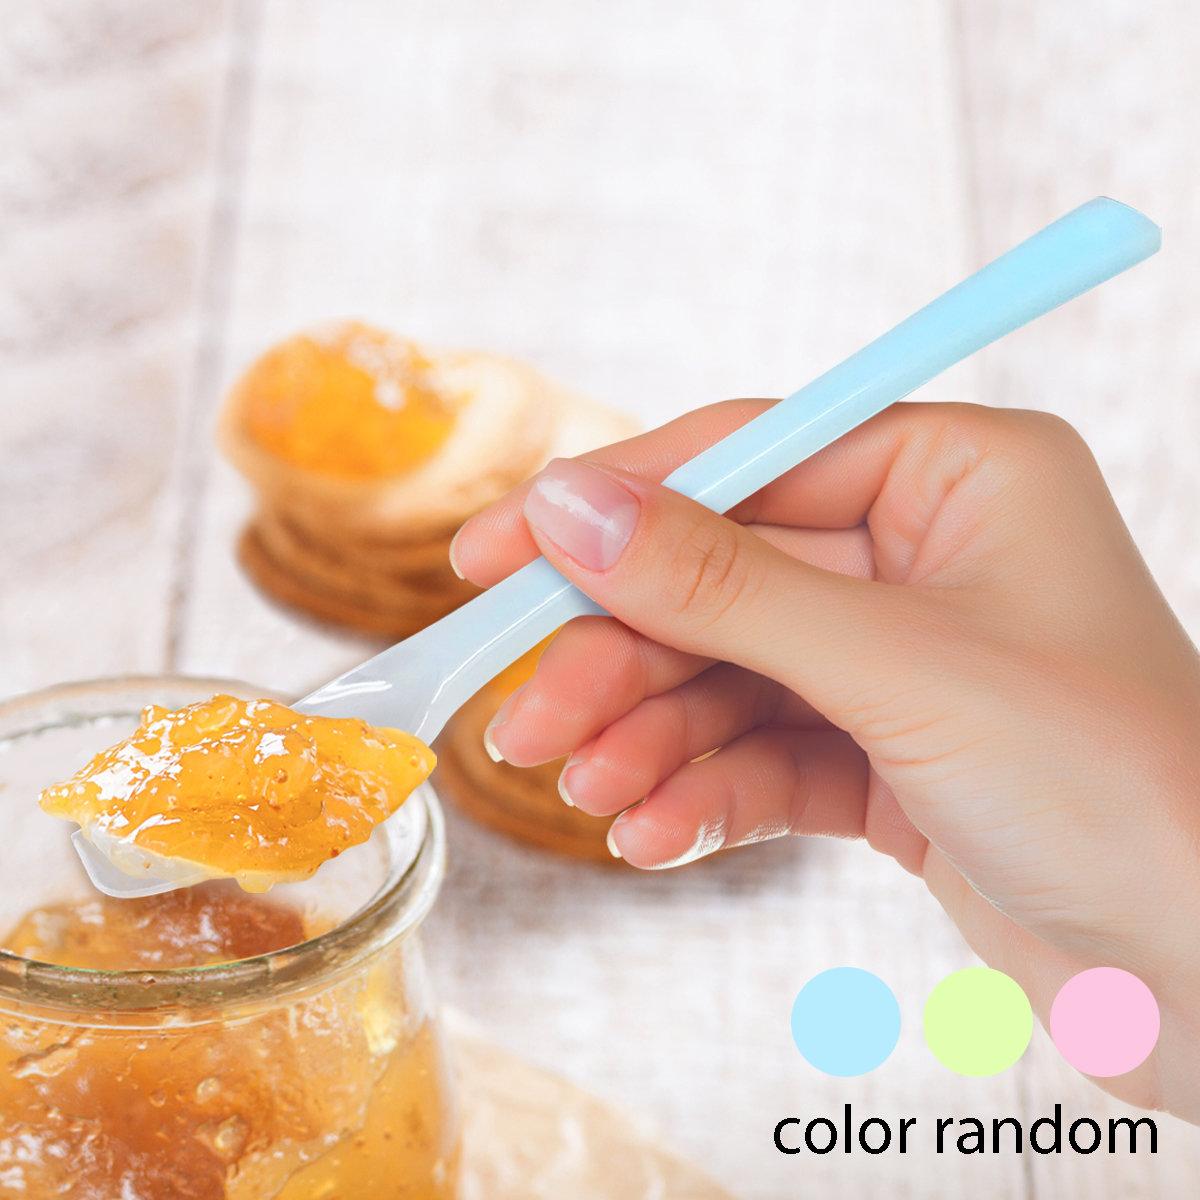 Made in Japan Slim Cooking Spatula Jam Spoon (Color Random) (315905)